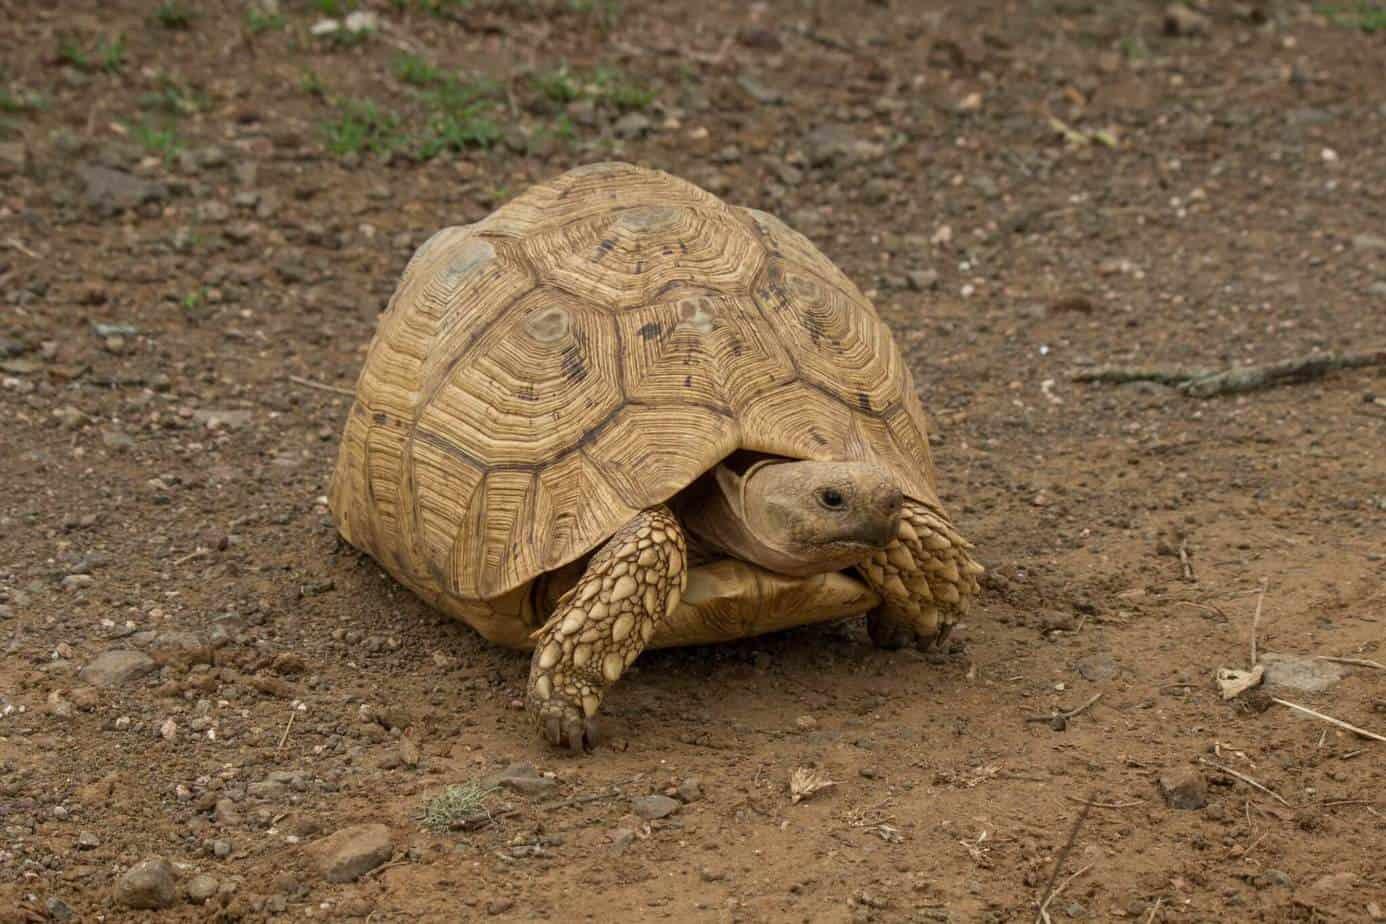 Leopard Tortoise @ Ndumo Game Reserve. Photo: Håvard Rosenlund